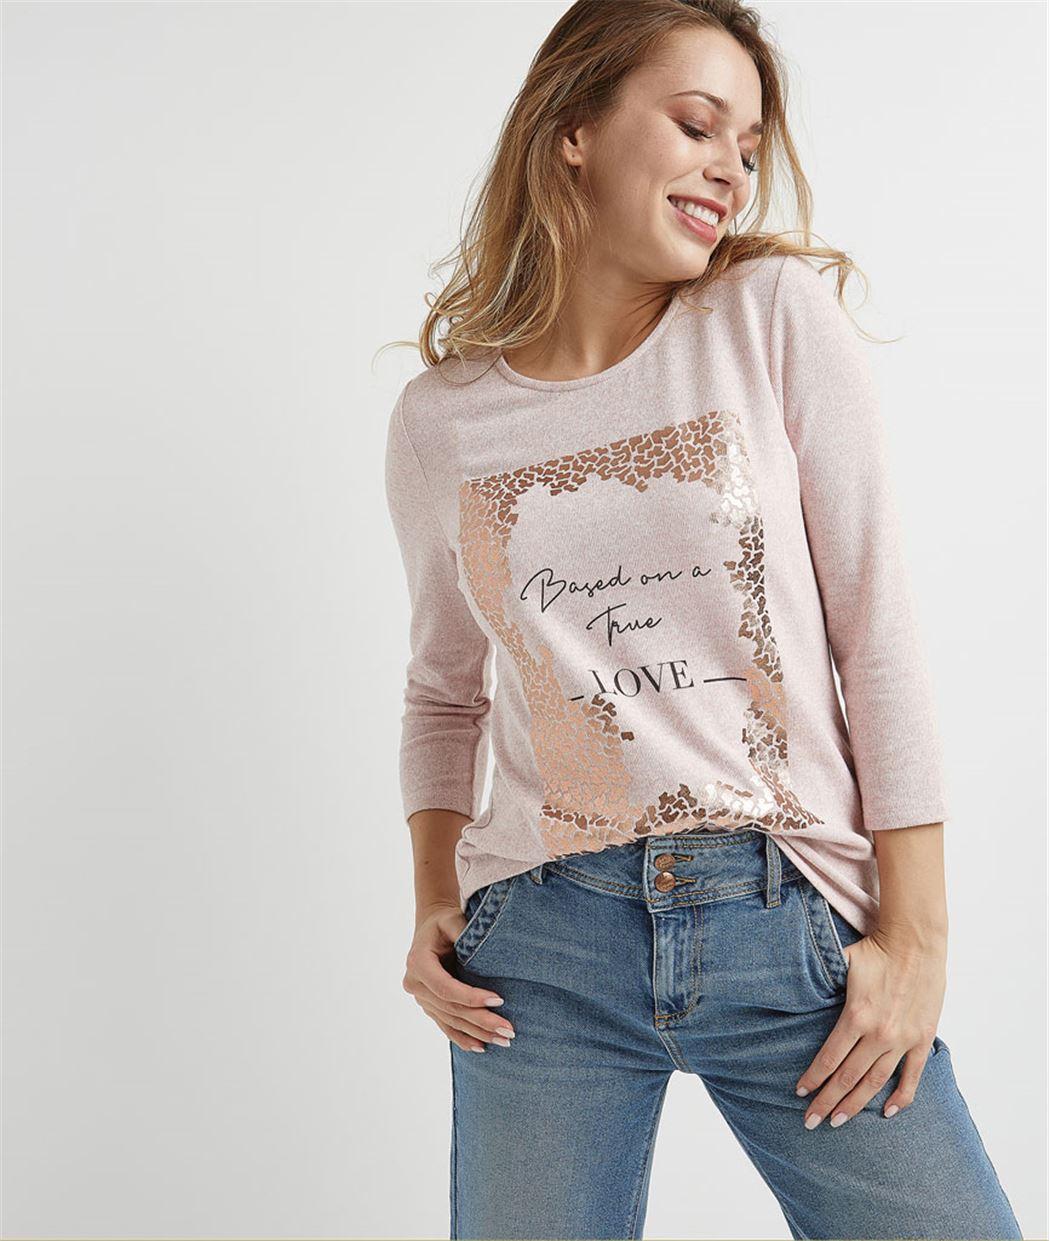 T-shirt femme avec print brillant ROSE